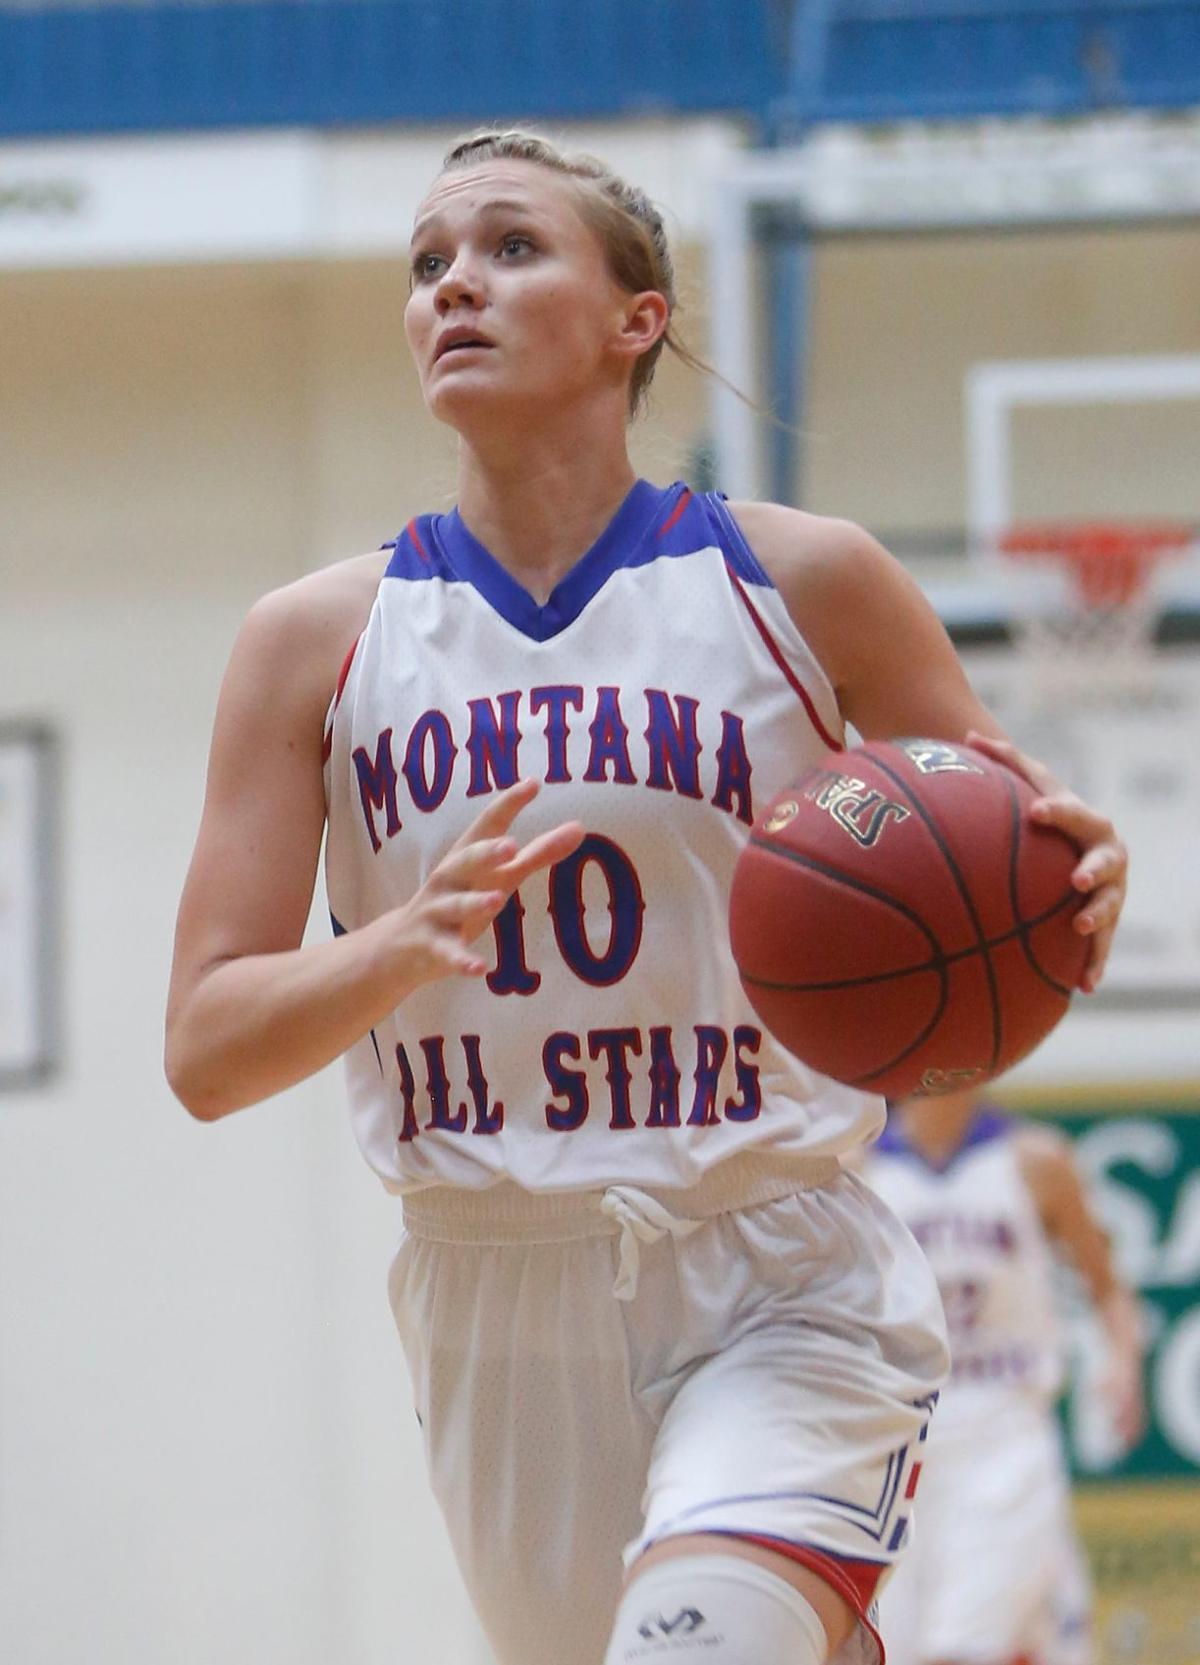 All Star Games, Montana vs Wyoming